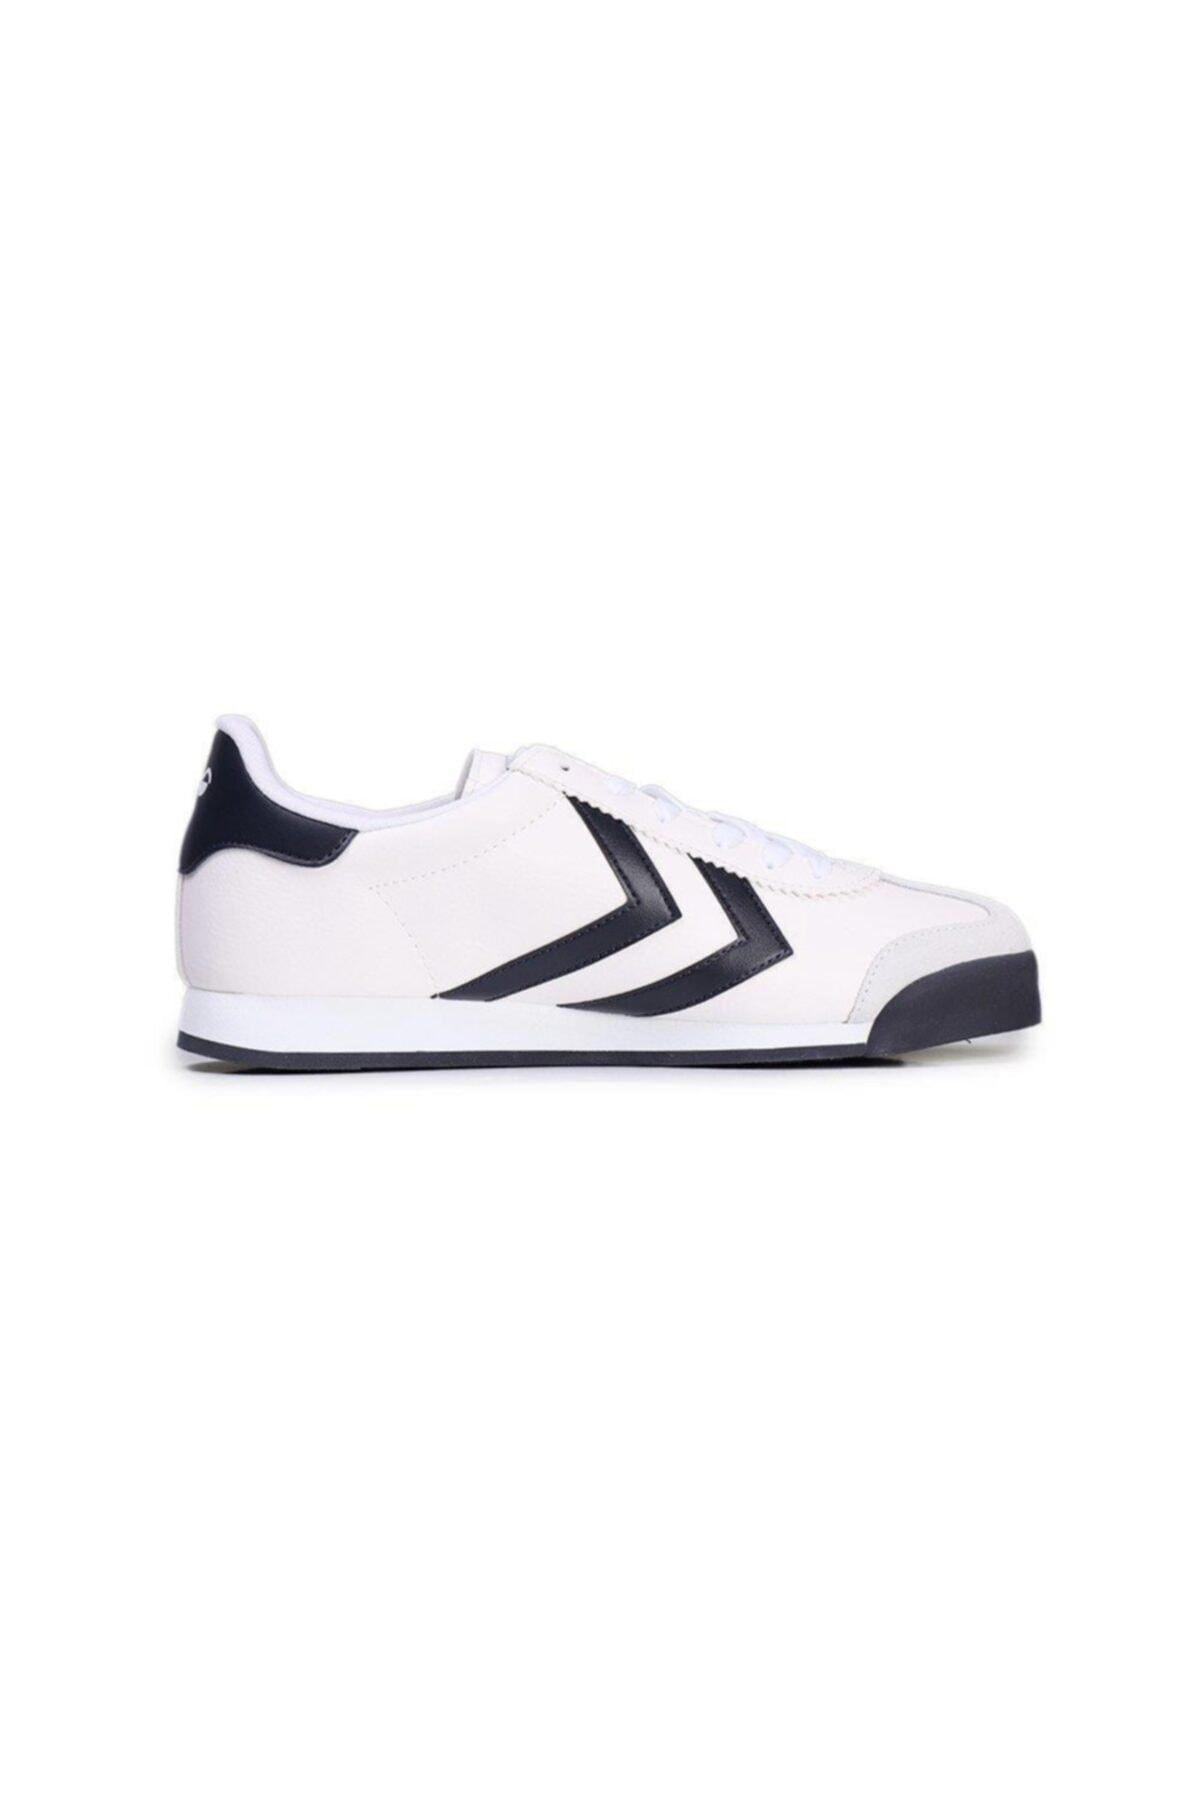 HUMMEL BERLIN SNEAKER Beyaz Erkek Sneaker Ayakkabı 100490259 1